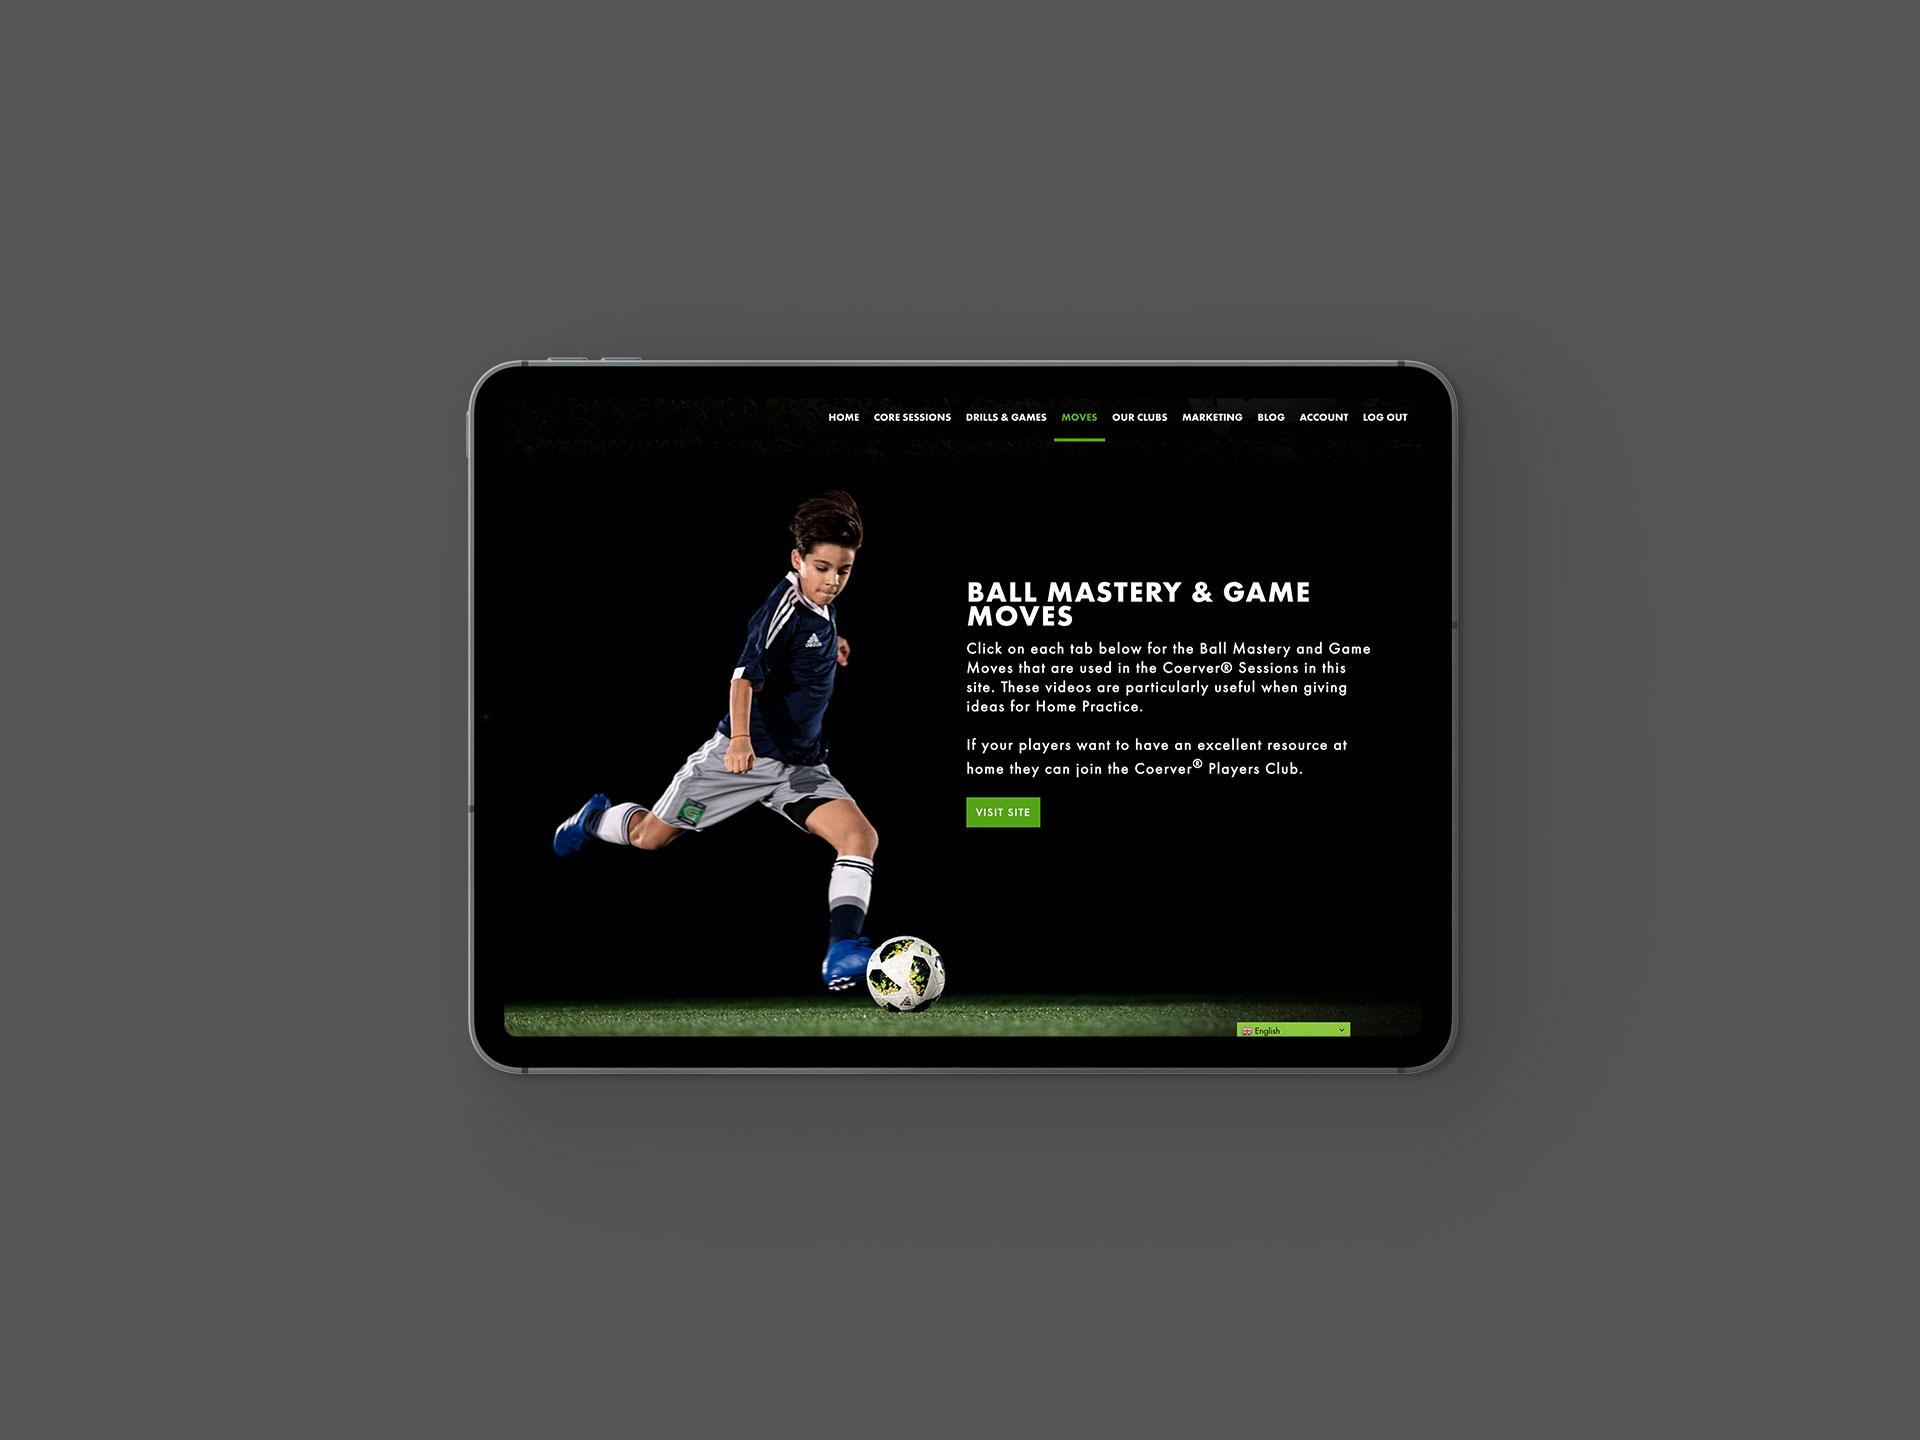 Coerver Partner Club Website Moves